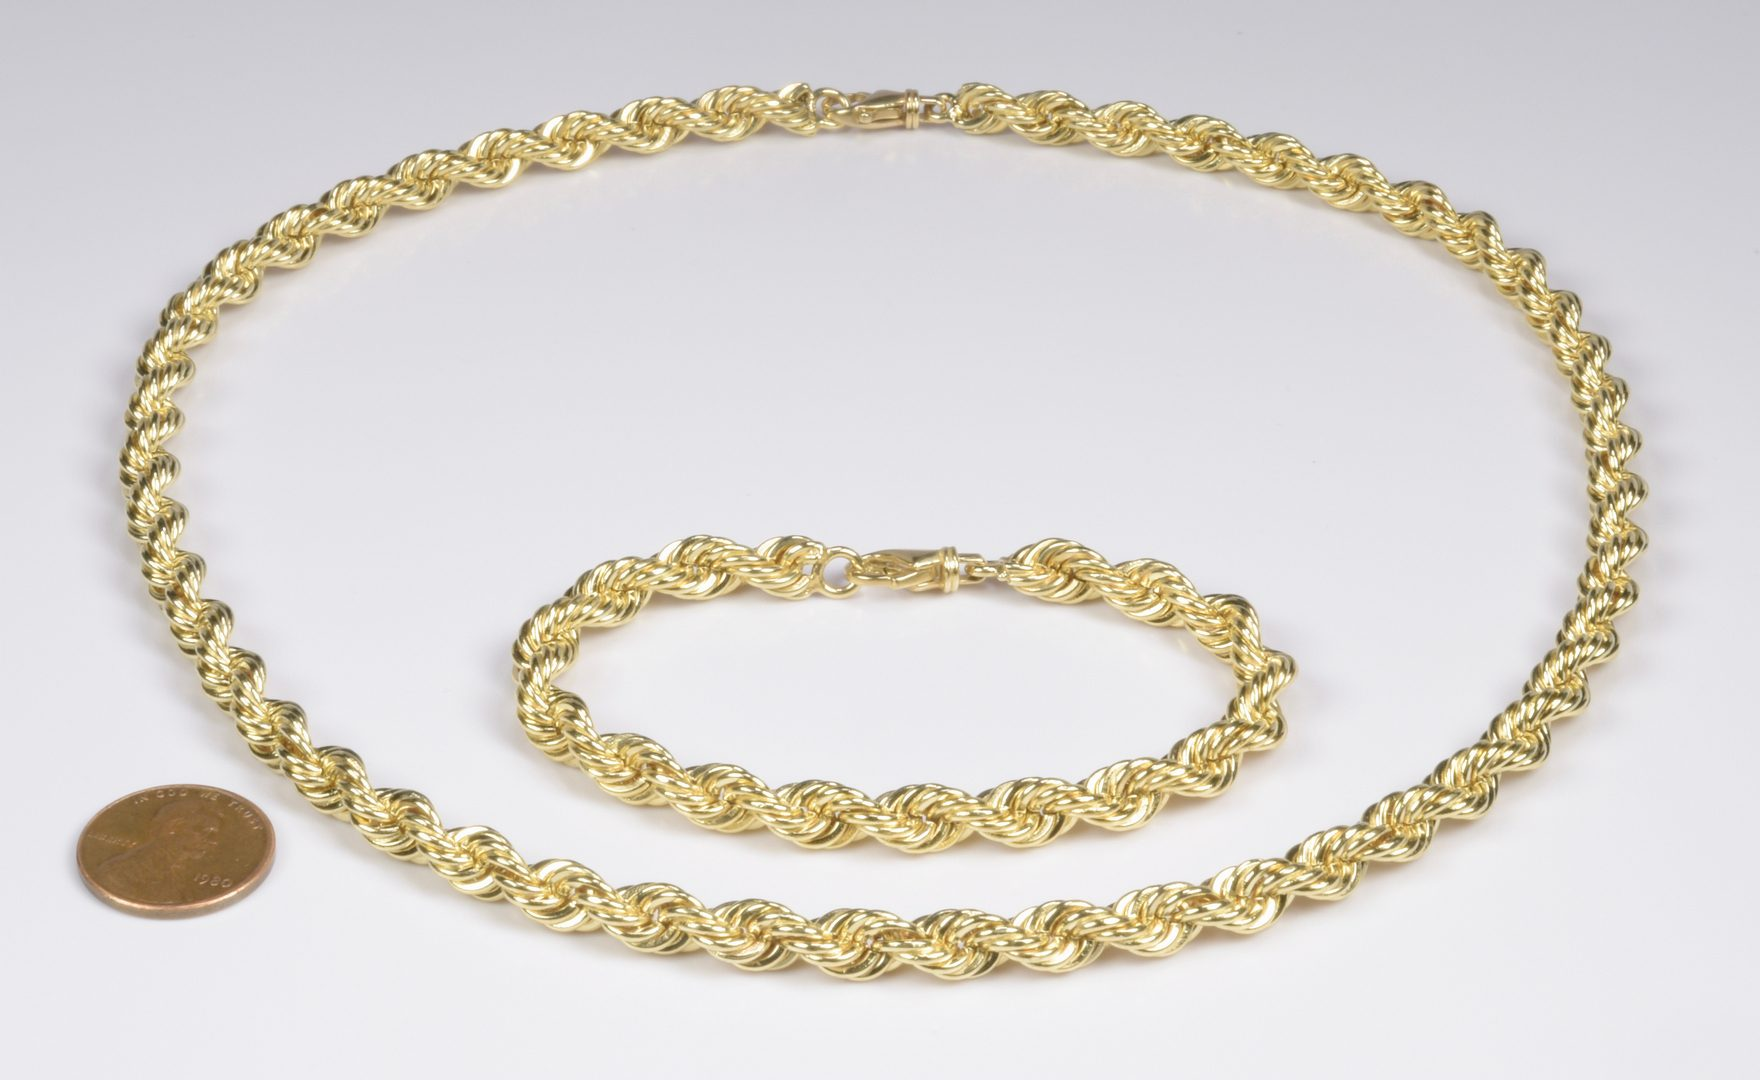 Lot 407: 14K Rope Necklace and Bracelet Set, 110 g